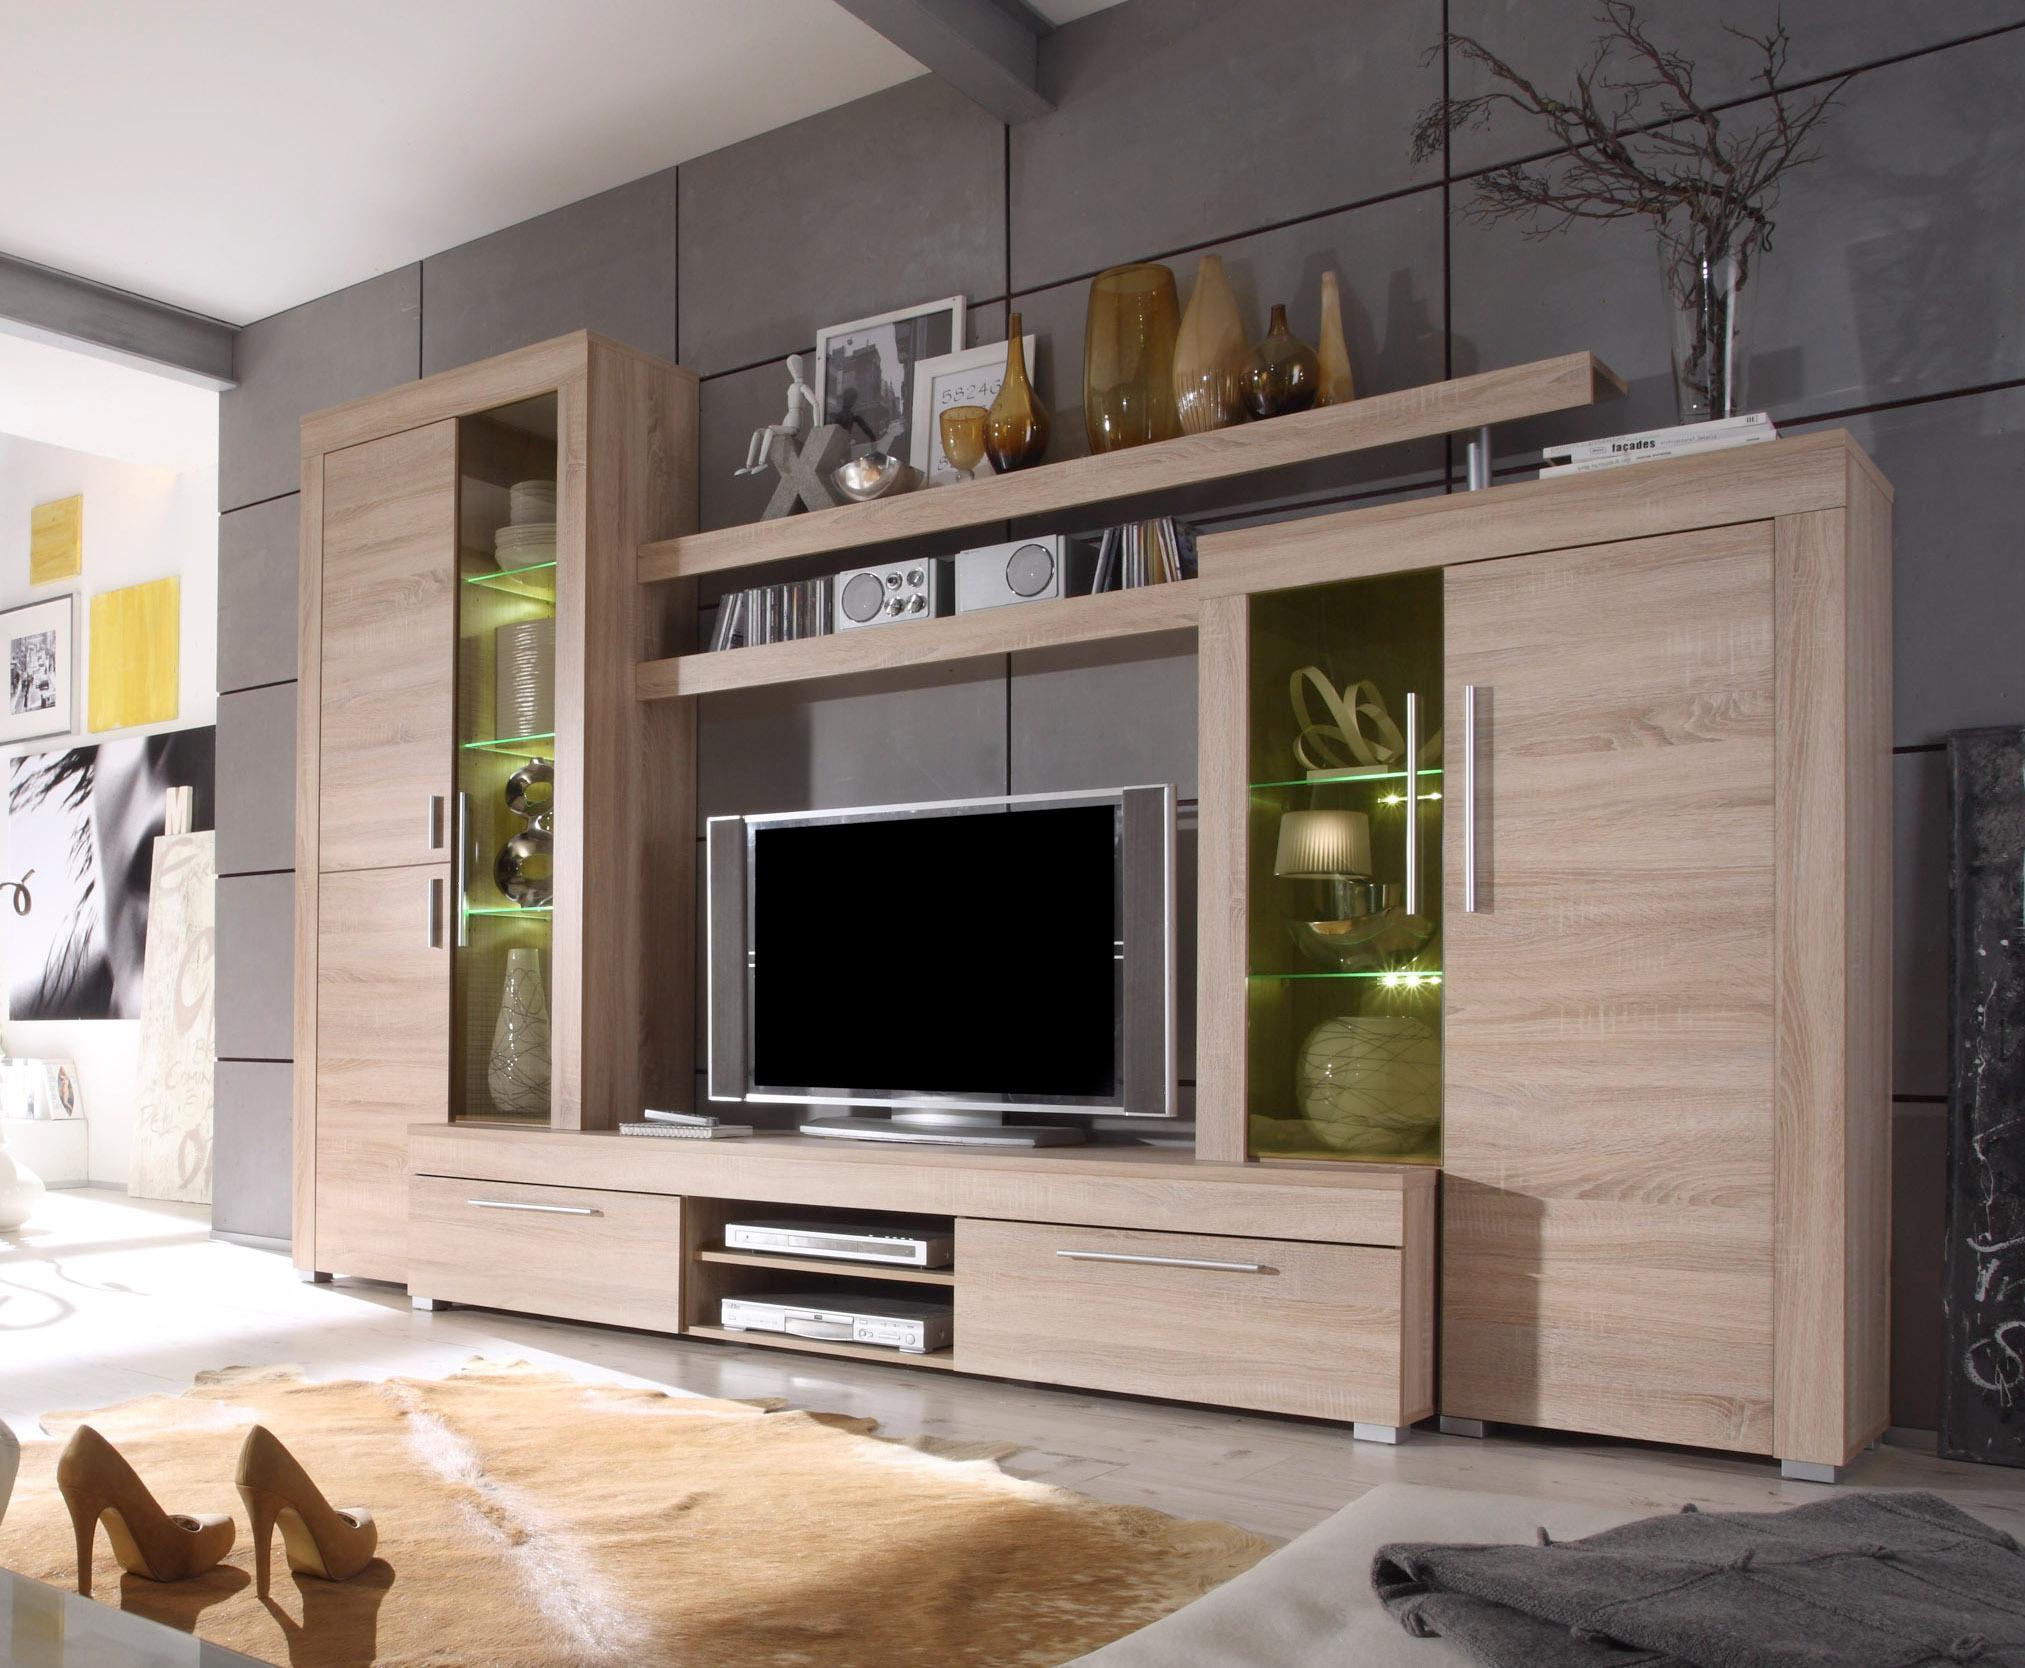 wohnwand boom schrankwand inkl led beleuchtung schnelle lieferung ebay. Black Bedroom Furniture Sets. Home Design Ideas